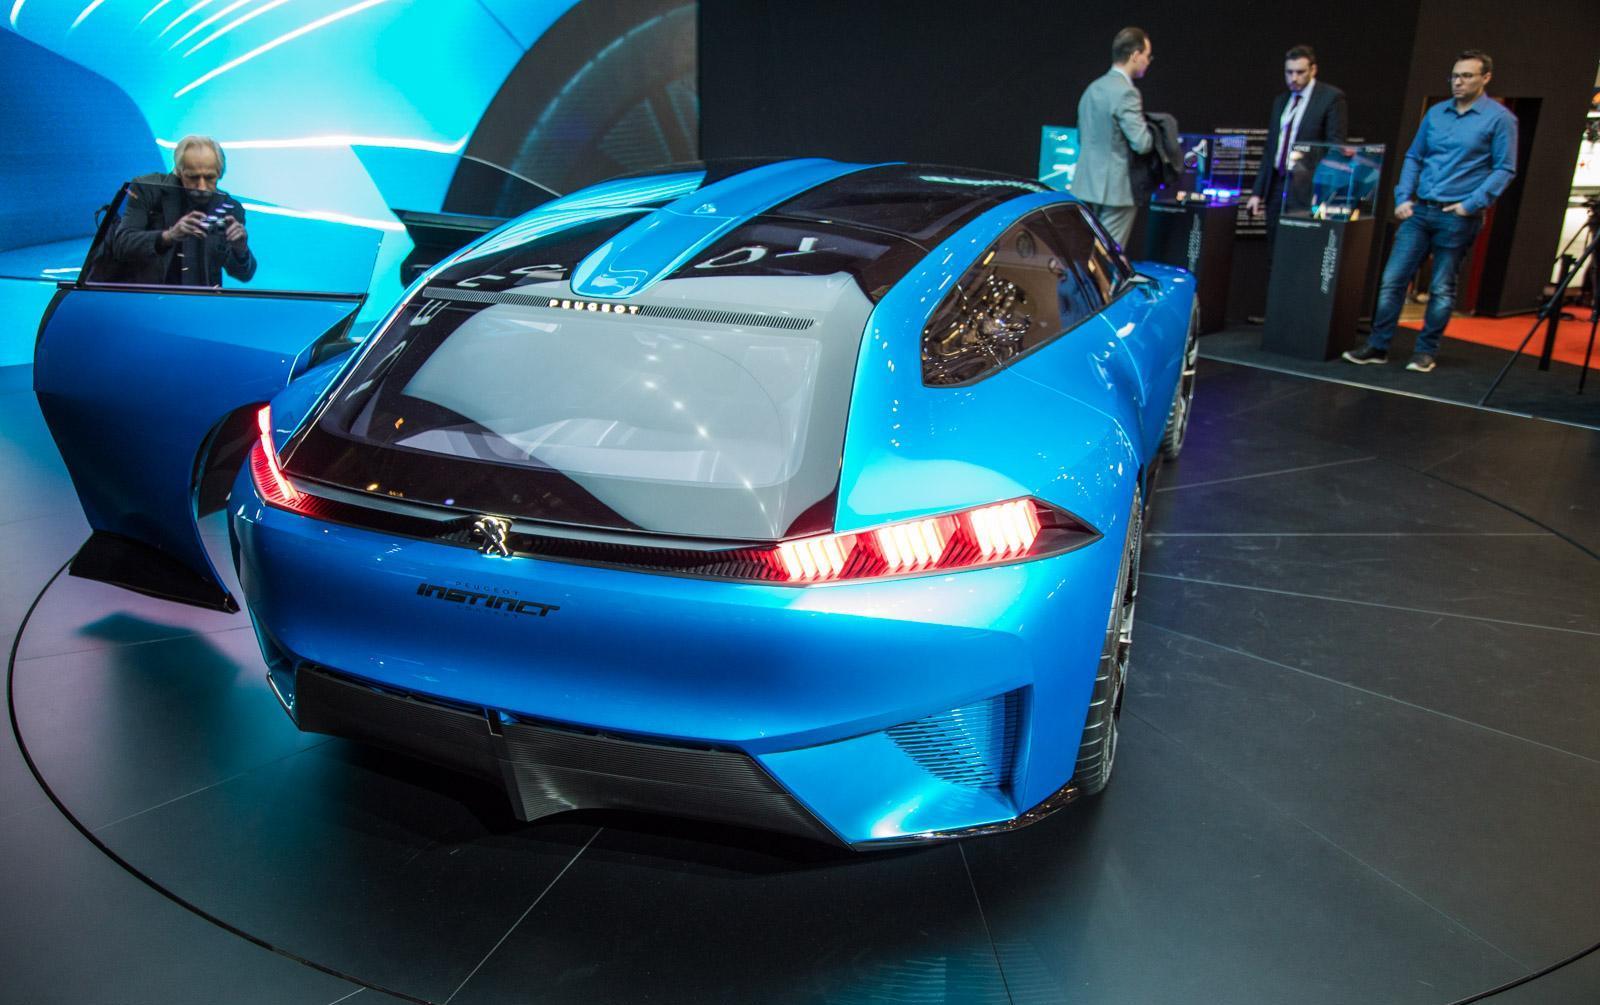 Peugeot-instinct-concept-012